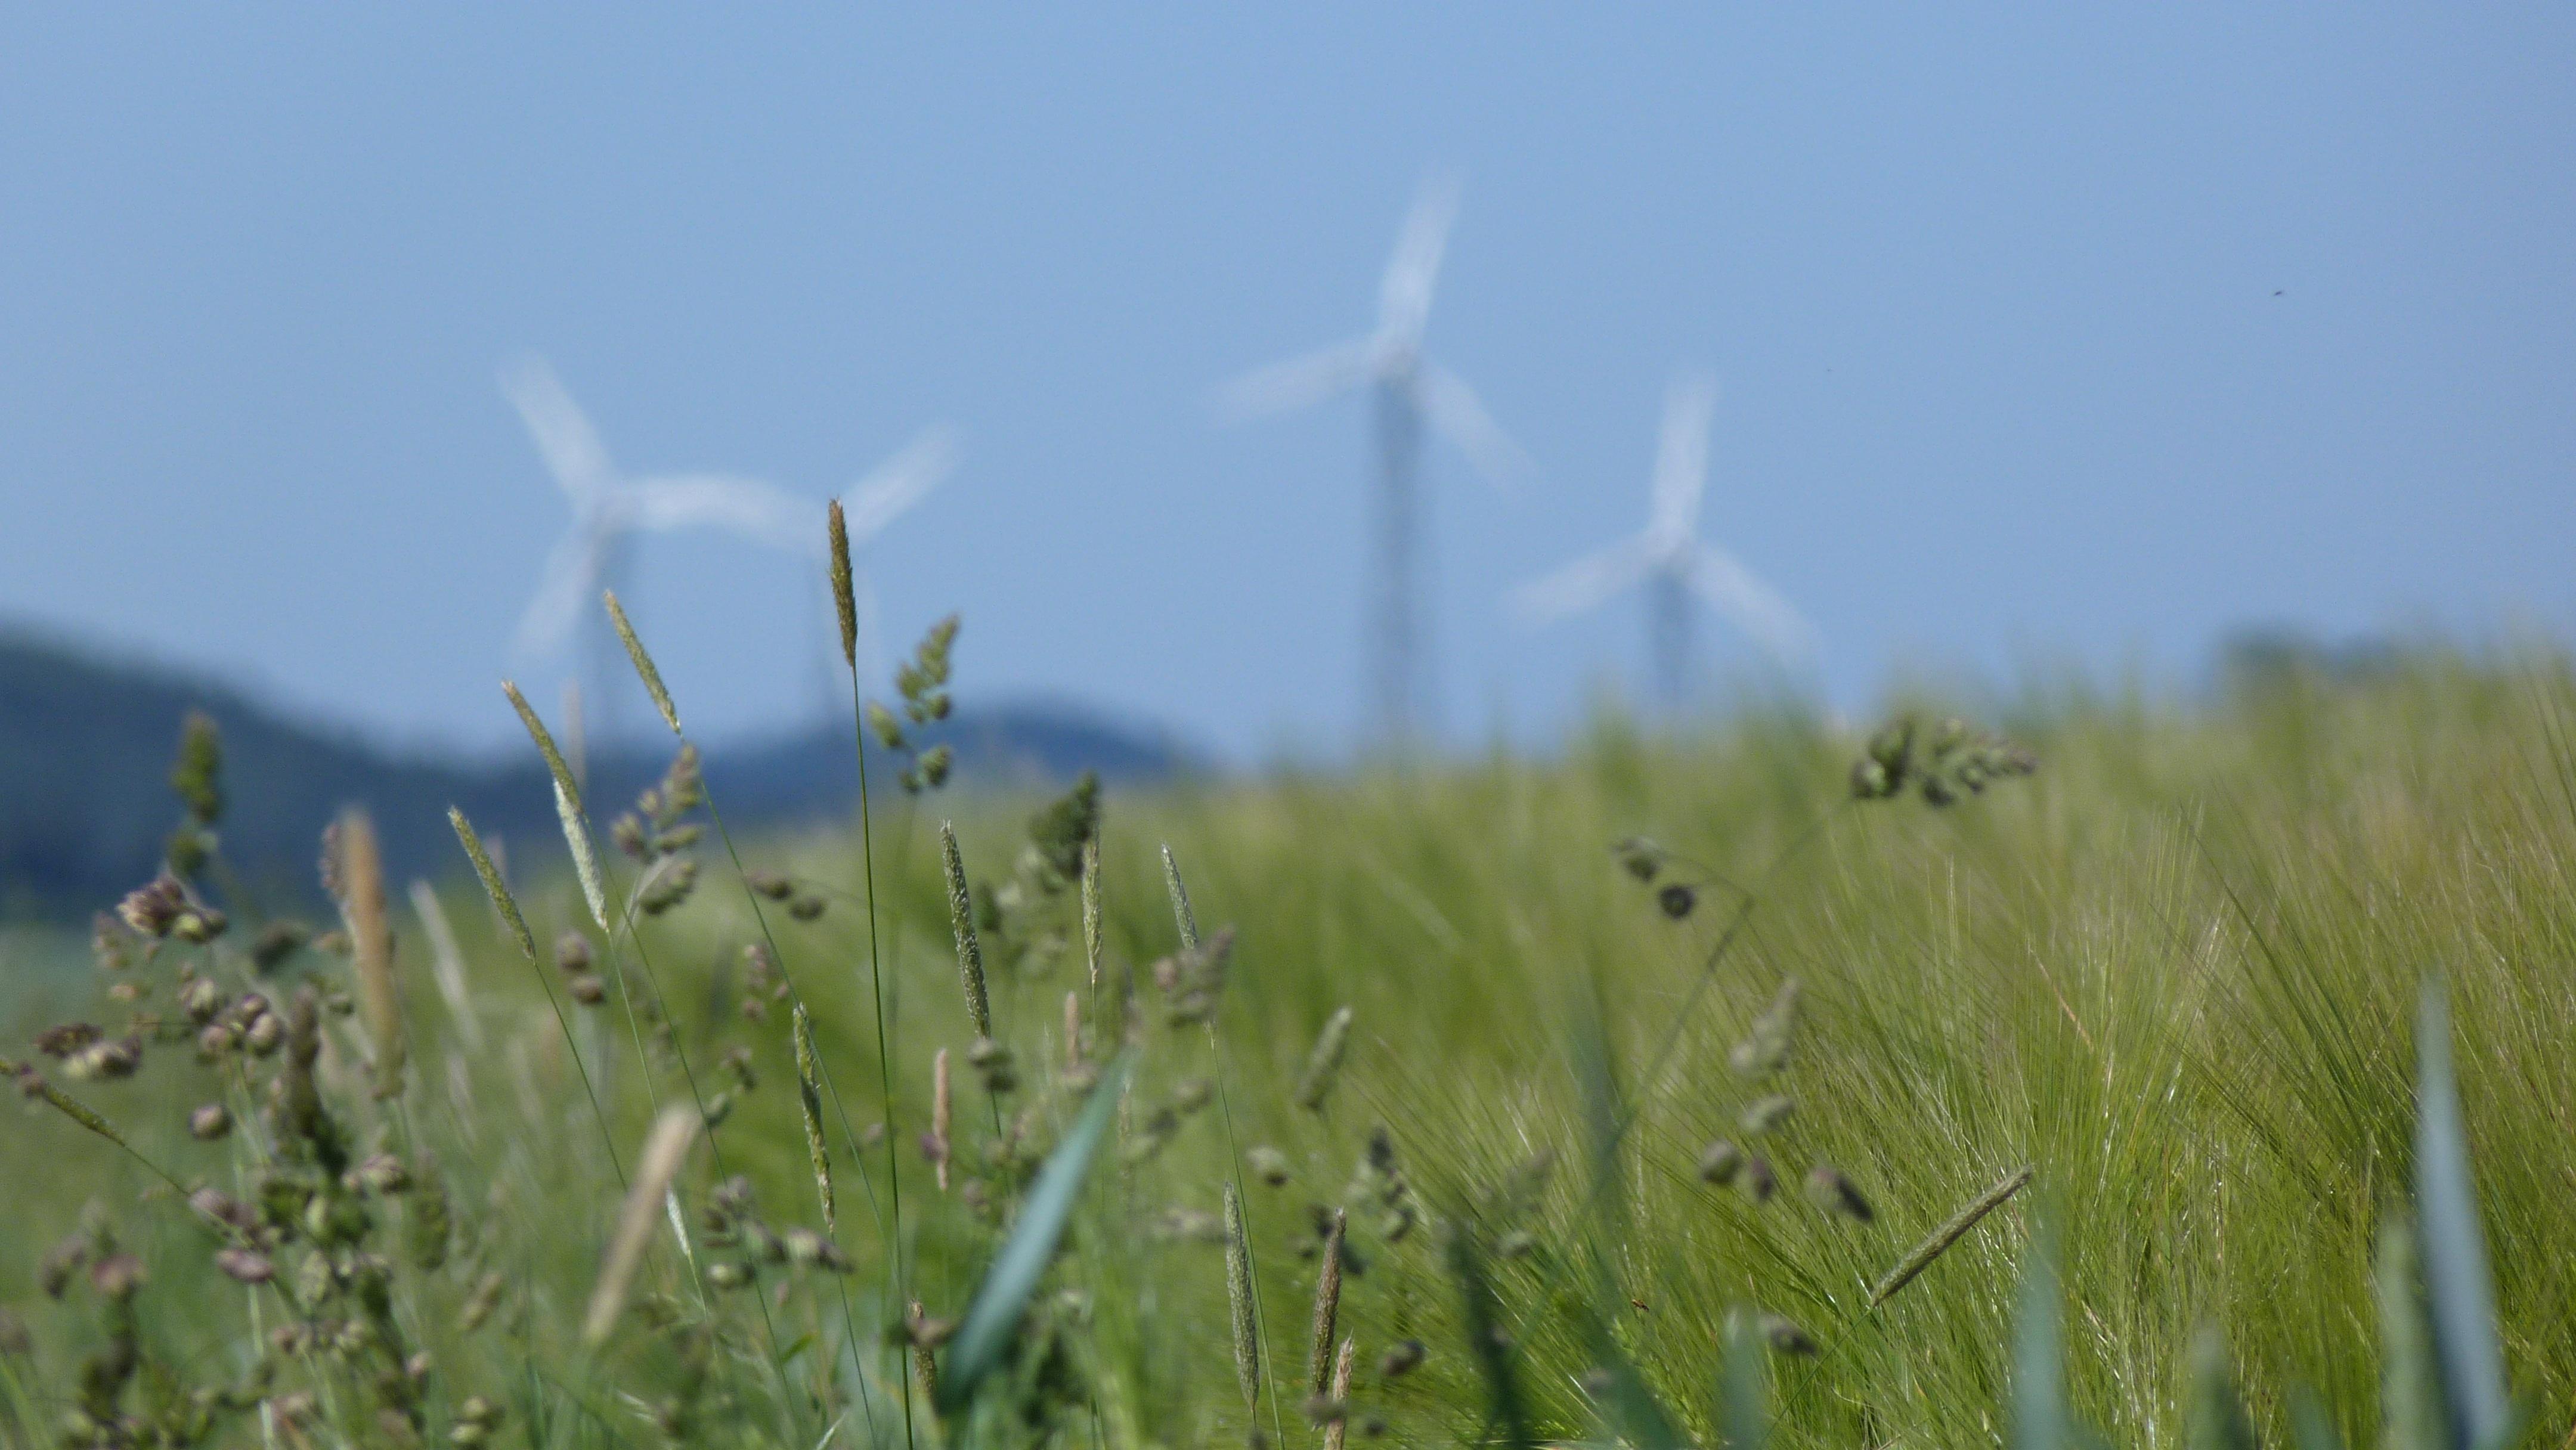 Windkraft-Erlass betont Schutz der Wohnbevölkerung